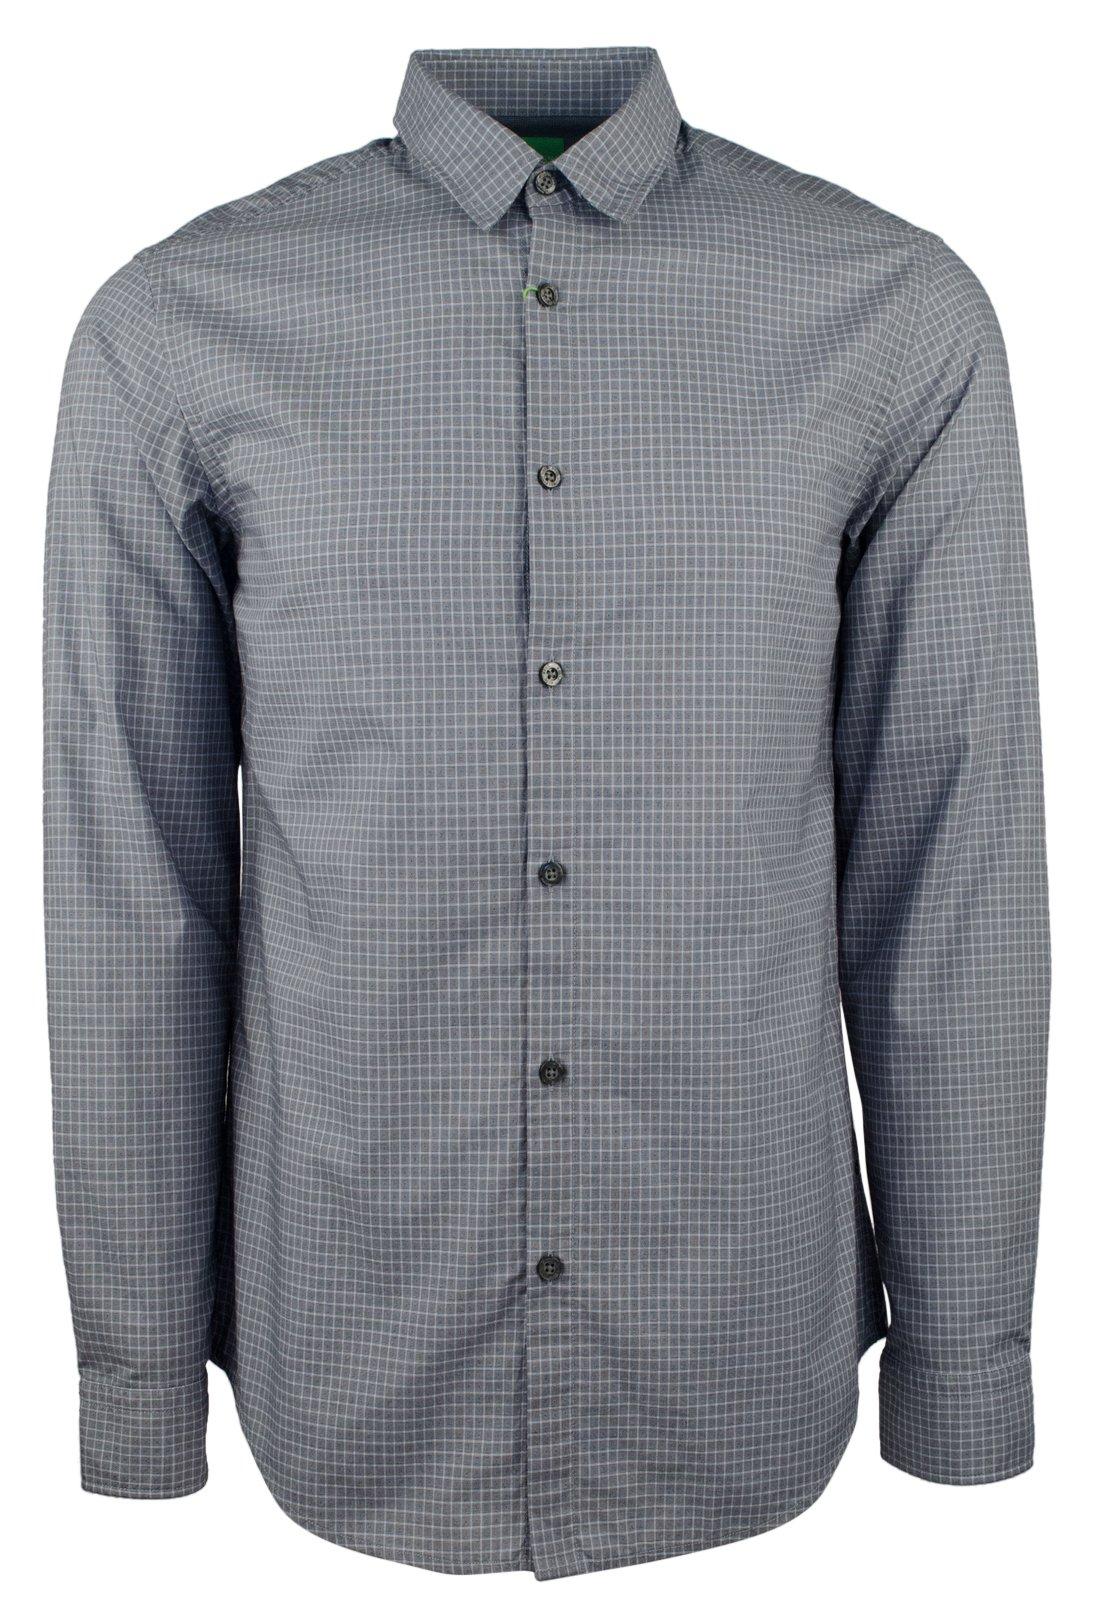 Hugo Boss Men's Green Label C-Bustai Regular Fit Geometric Dress Shirt-BG-S